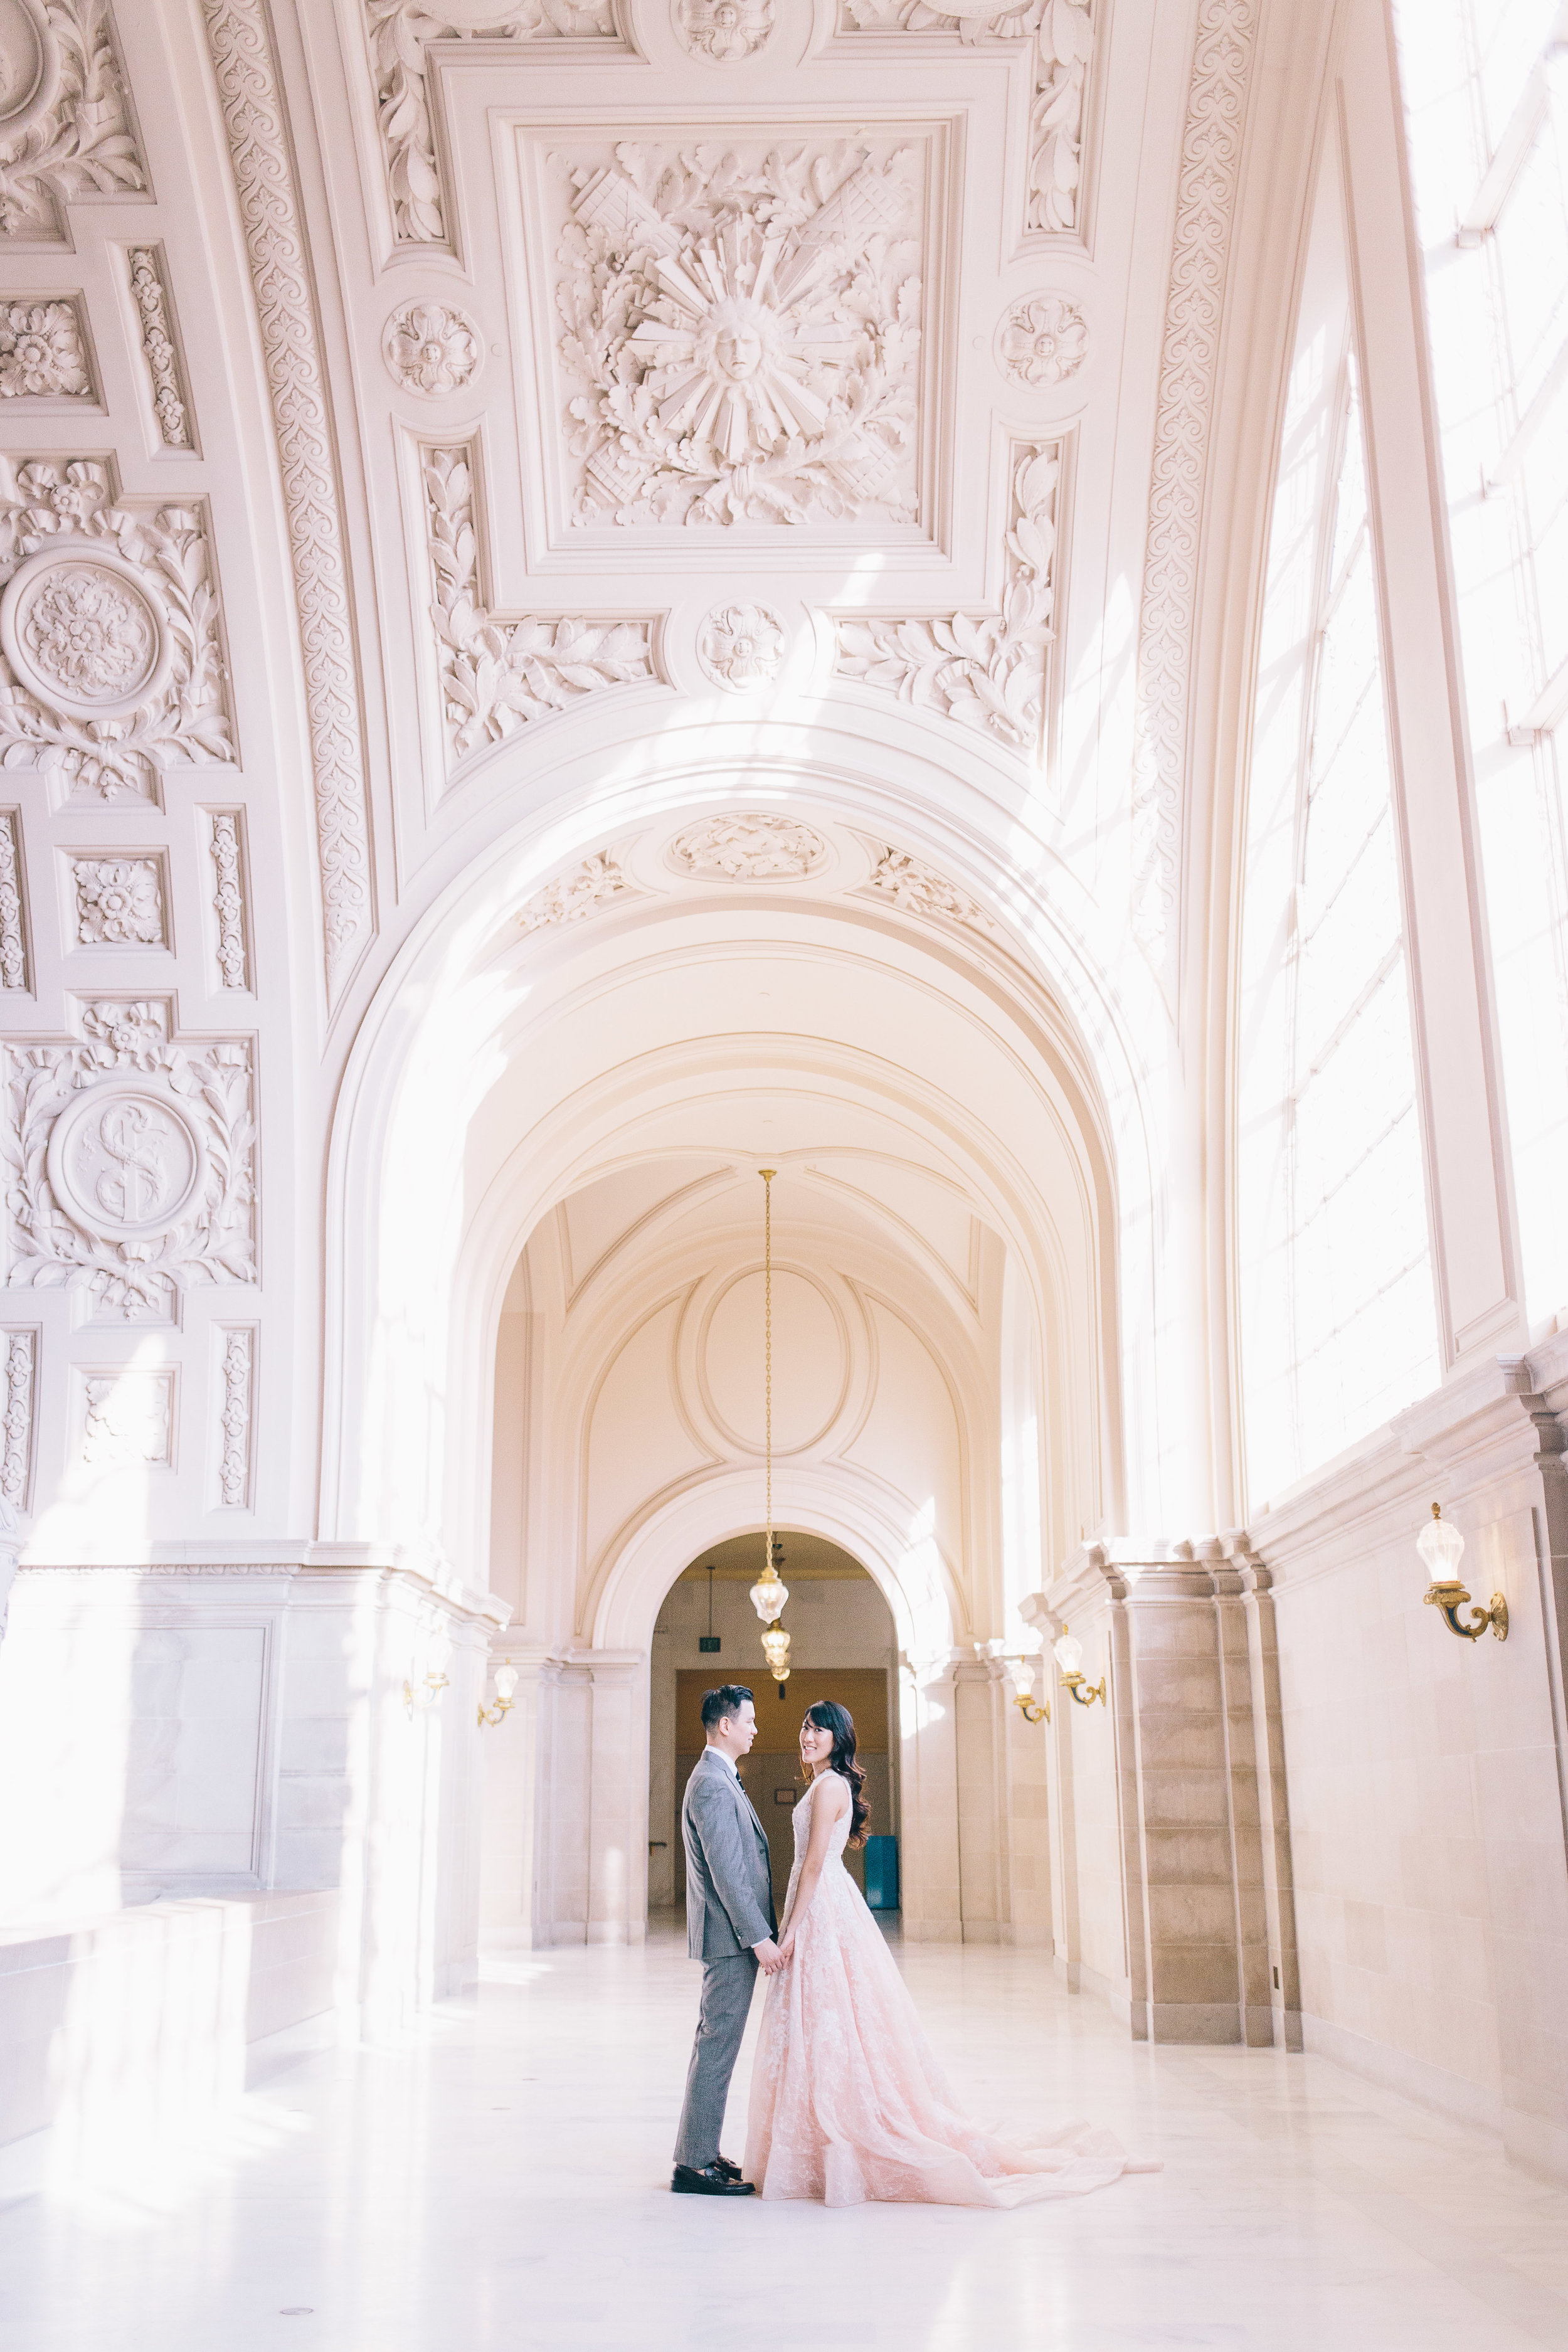 JBJ Pictures - Wedding Photographer San Francisco - Napa - Sonoma - SF Engagement Photos (11).jpg